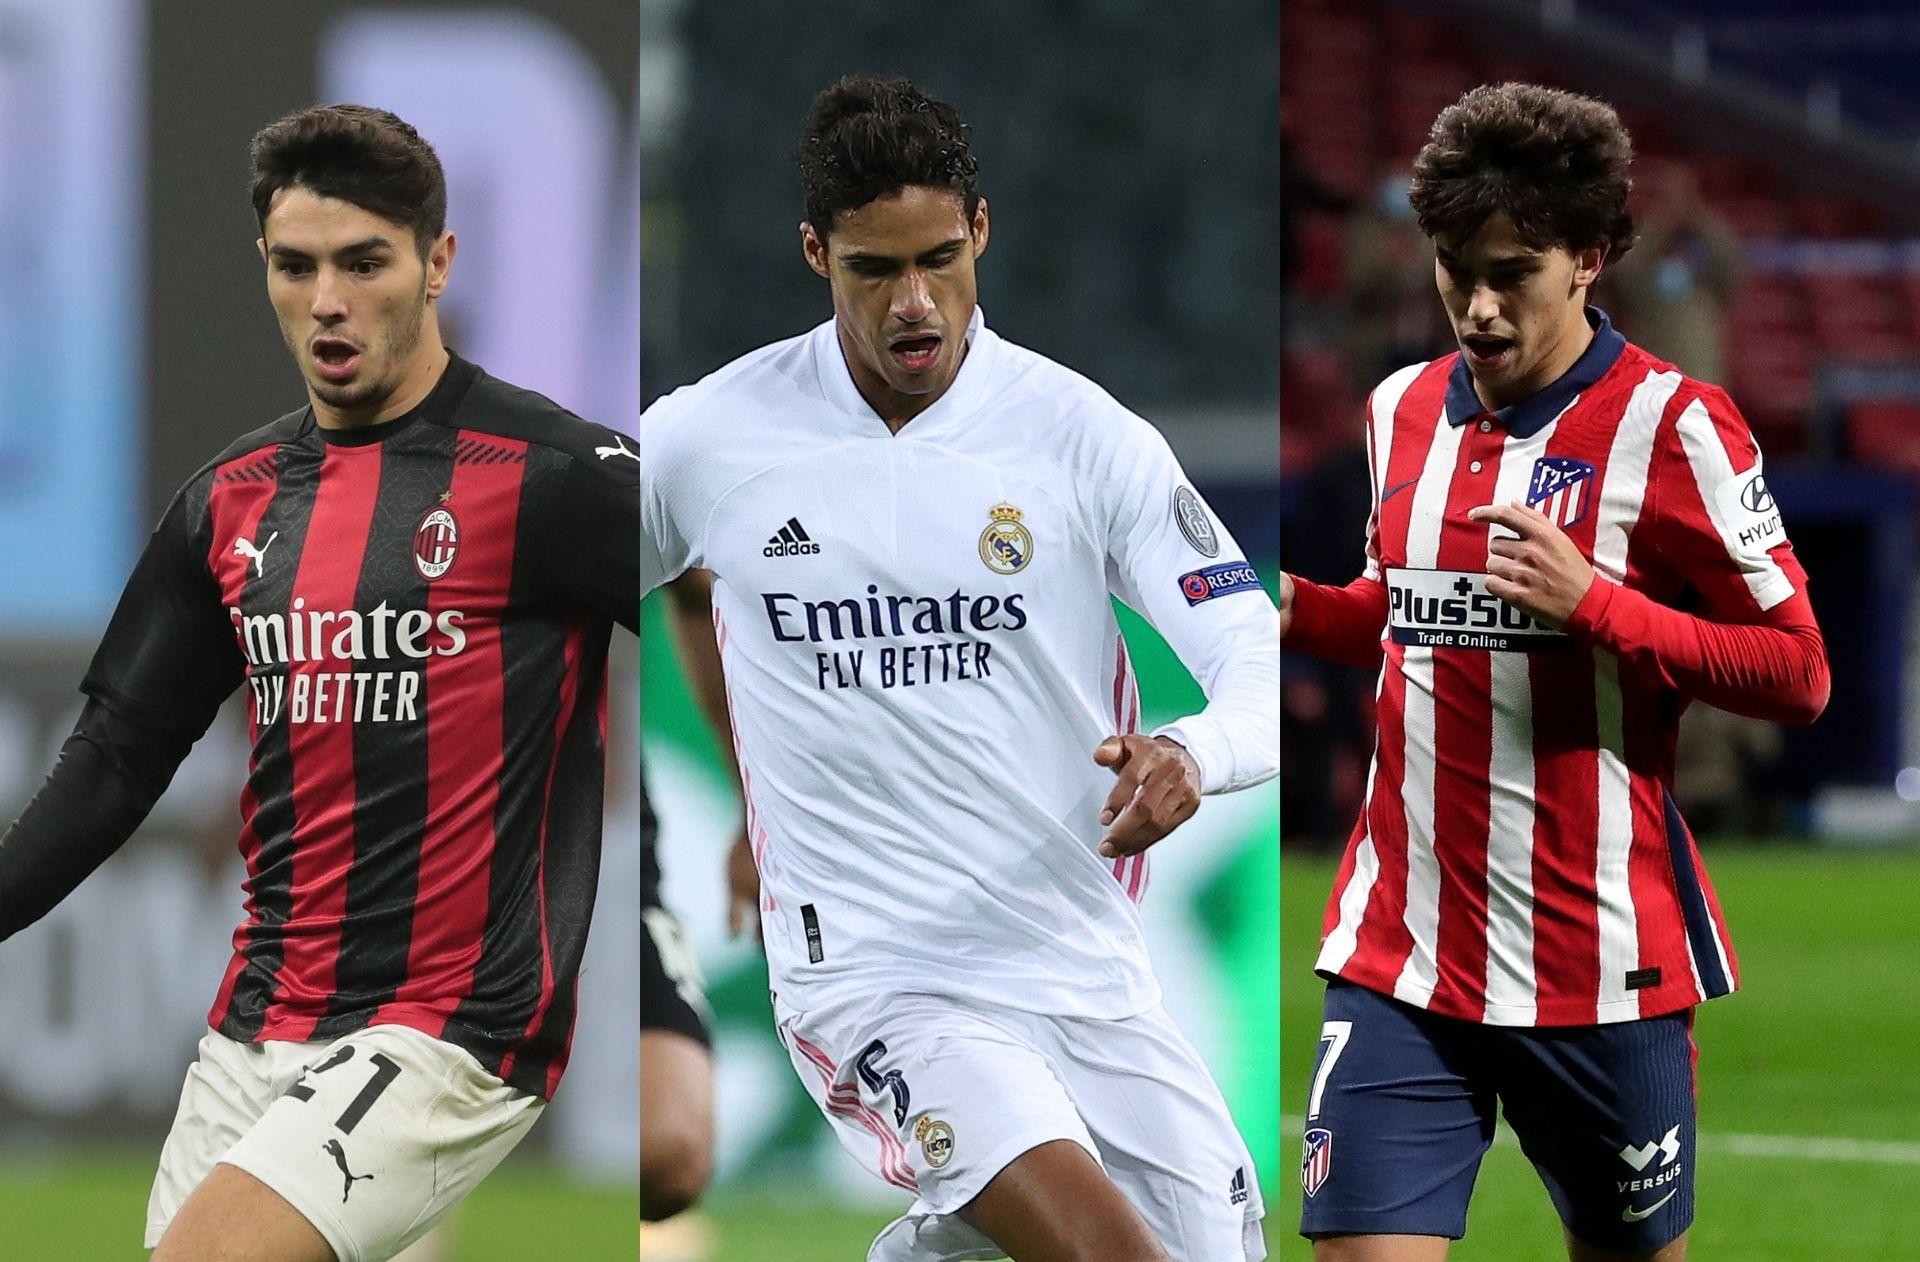 Brahim Diaz of AC Milan, Raphael Varane of Real Madrid, Joao Felix of Atletico Madrid